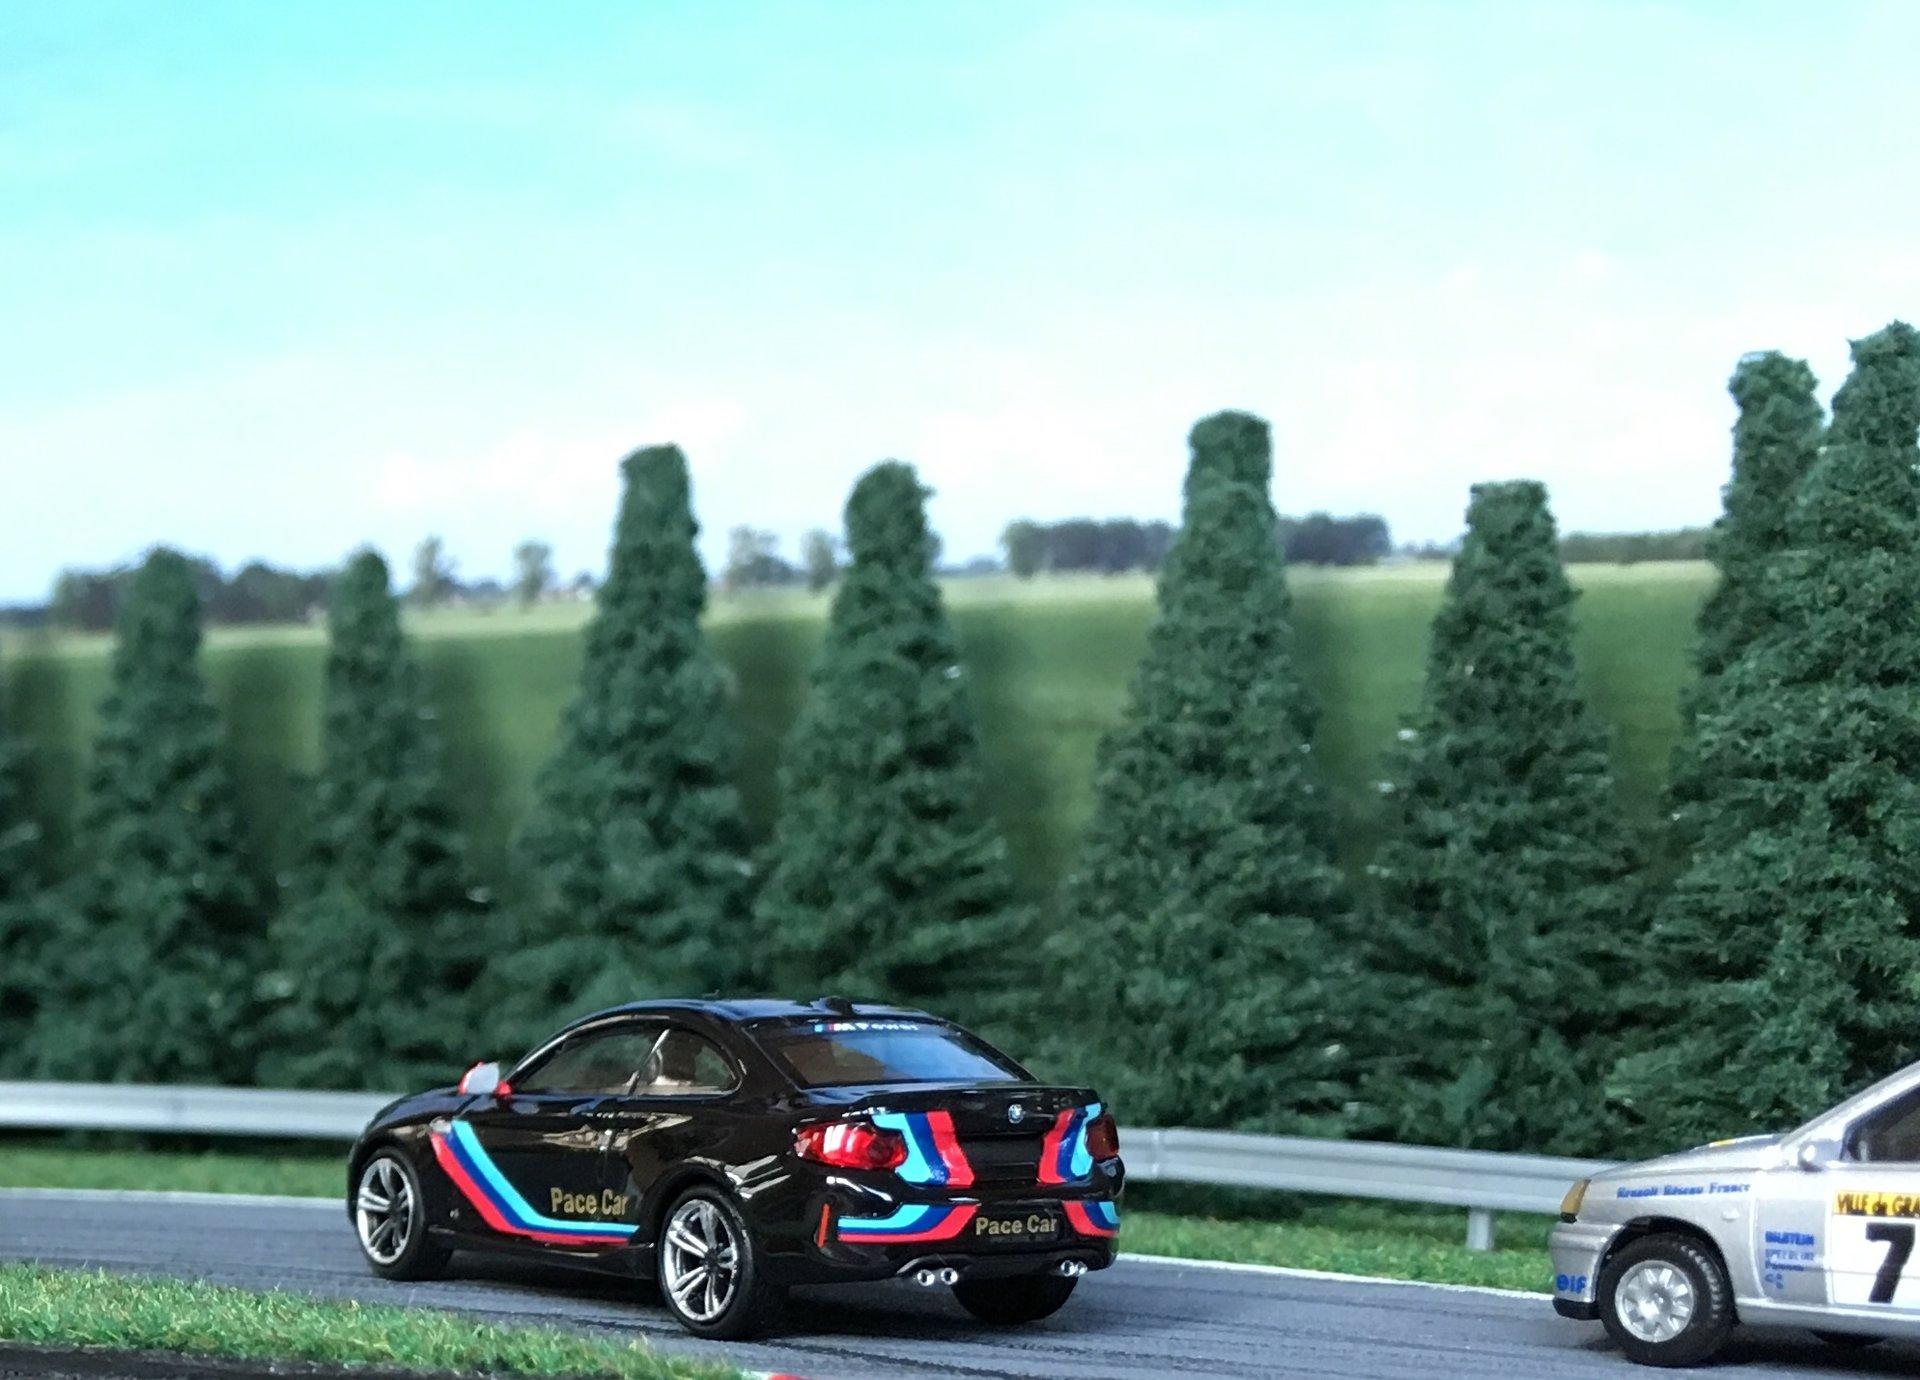 BMW M2 Pace car 007.jpg